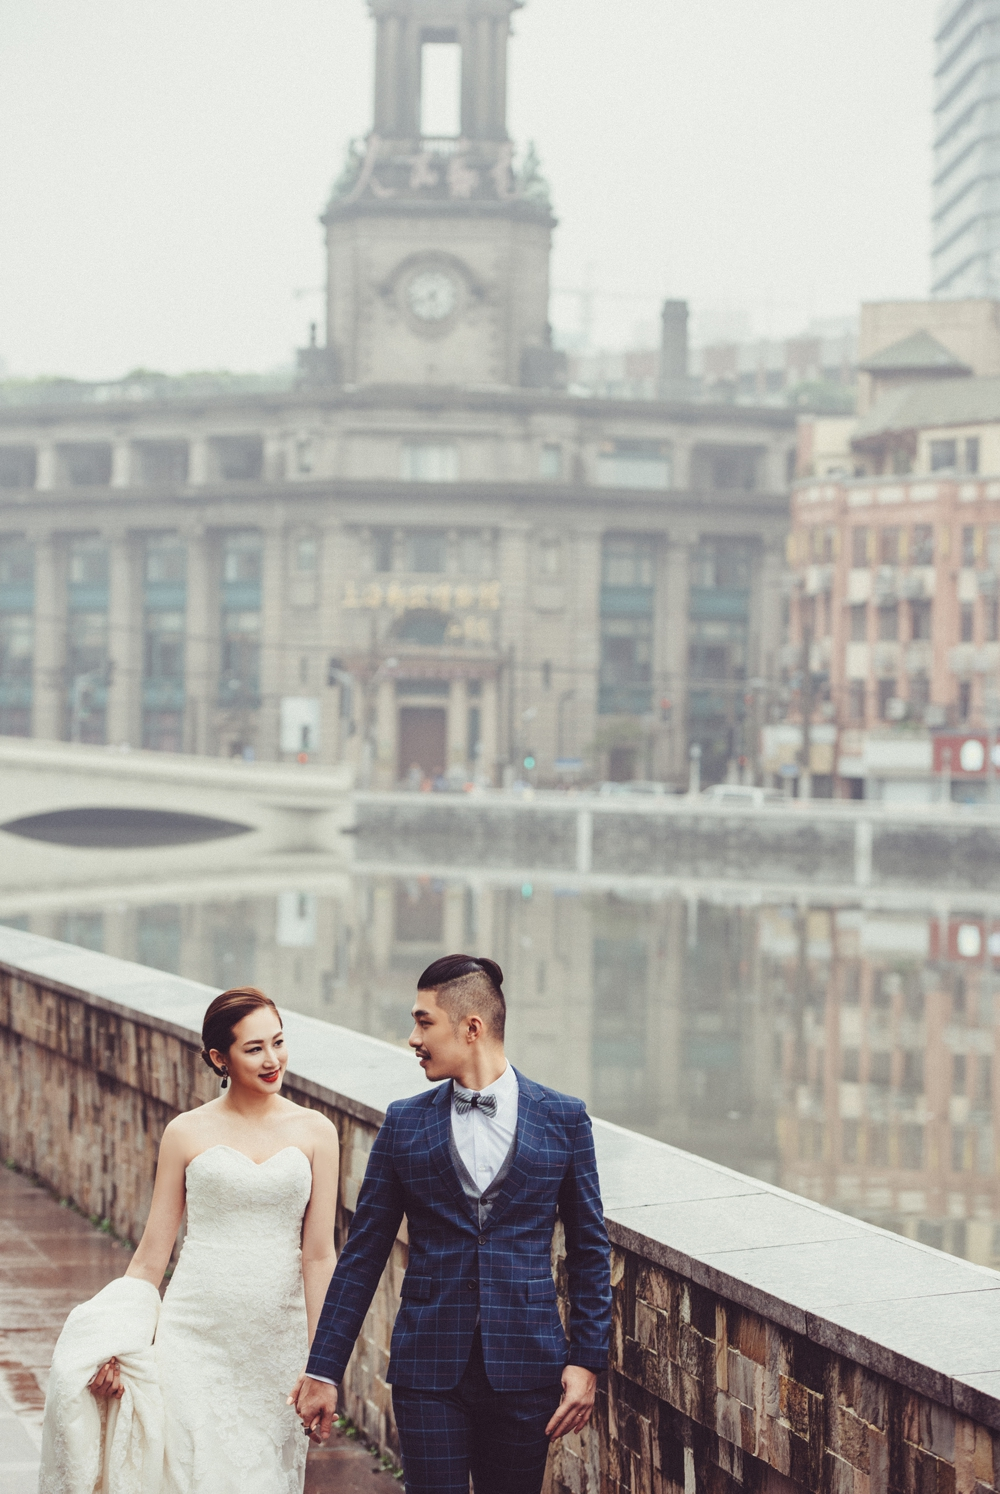 PUREFOTO_海外婚紗攝影Oversea_Prewedding_郵政總局上海婚紗